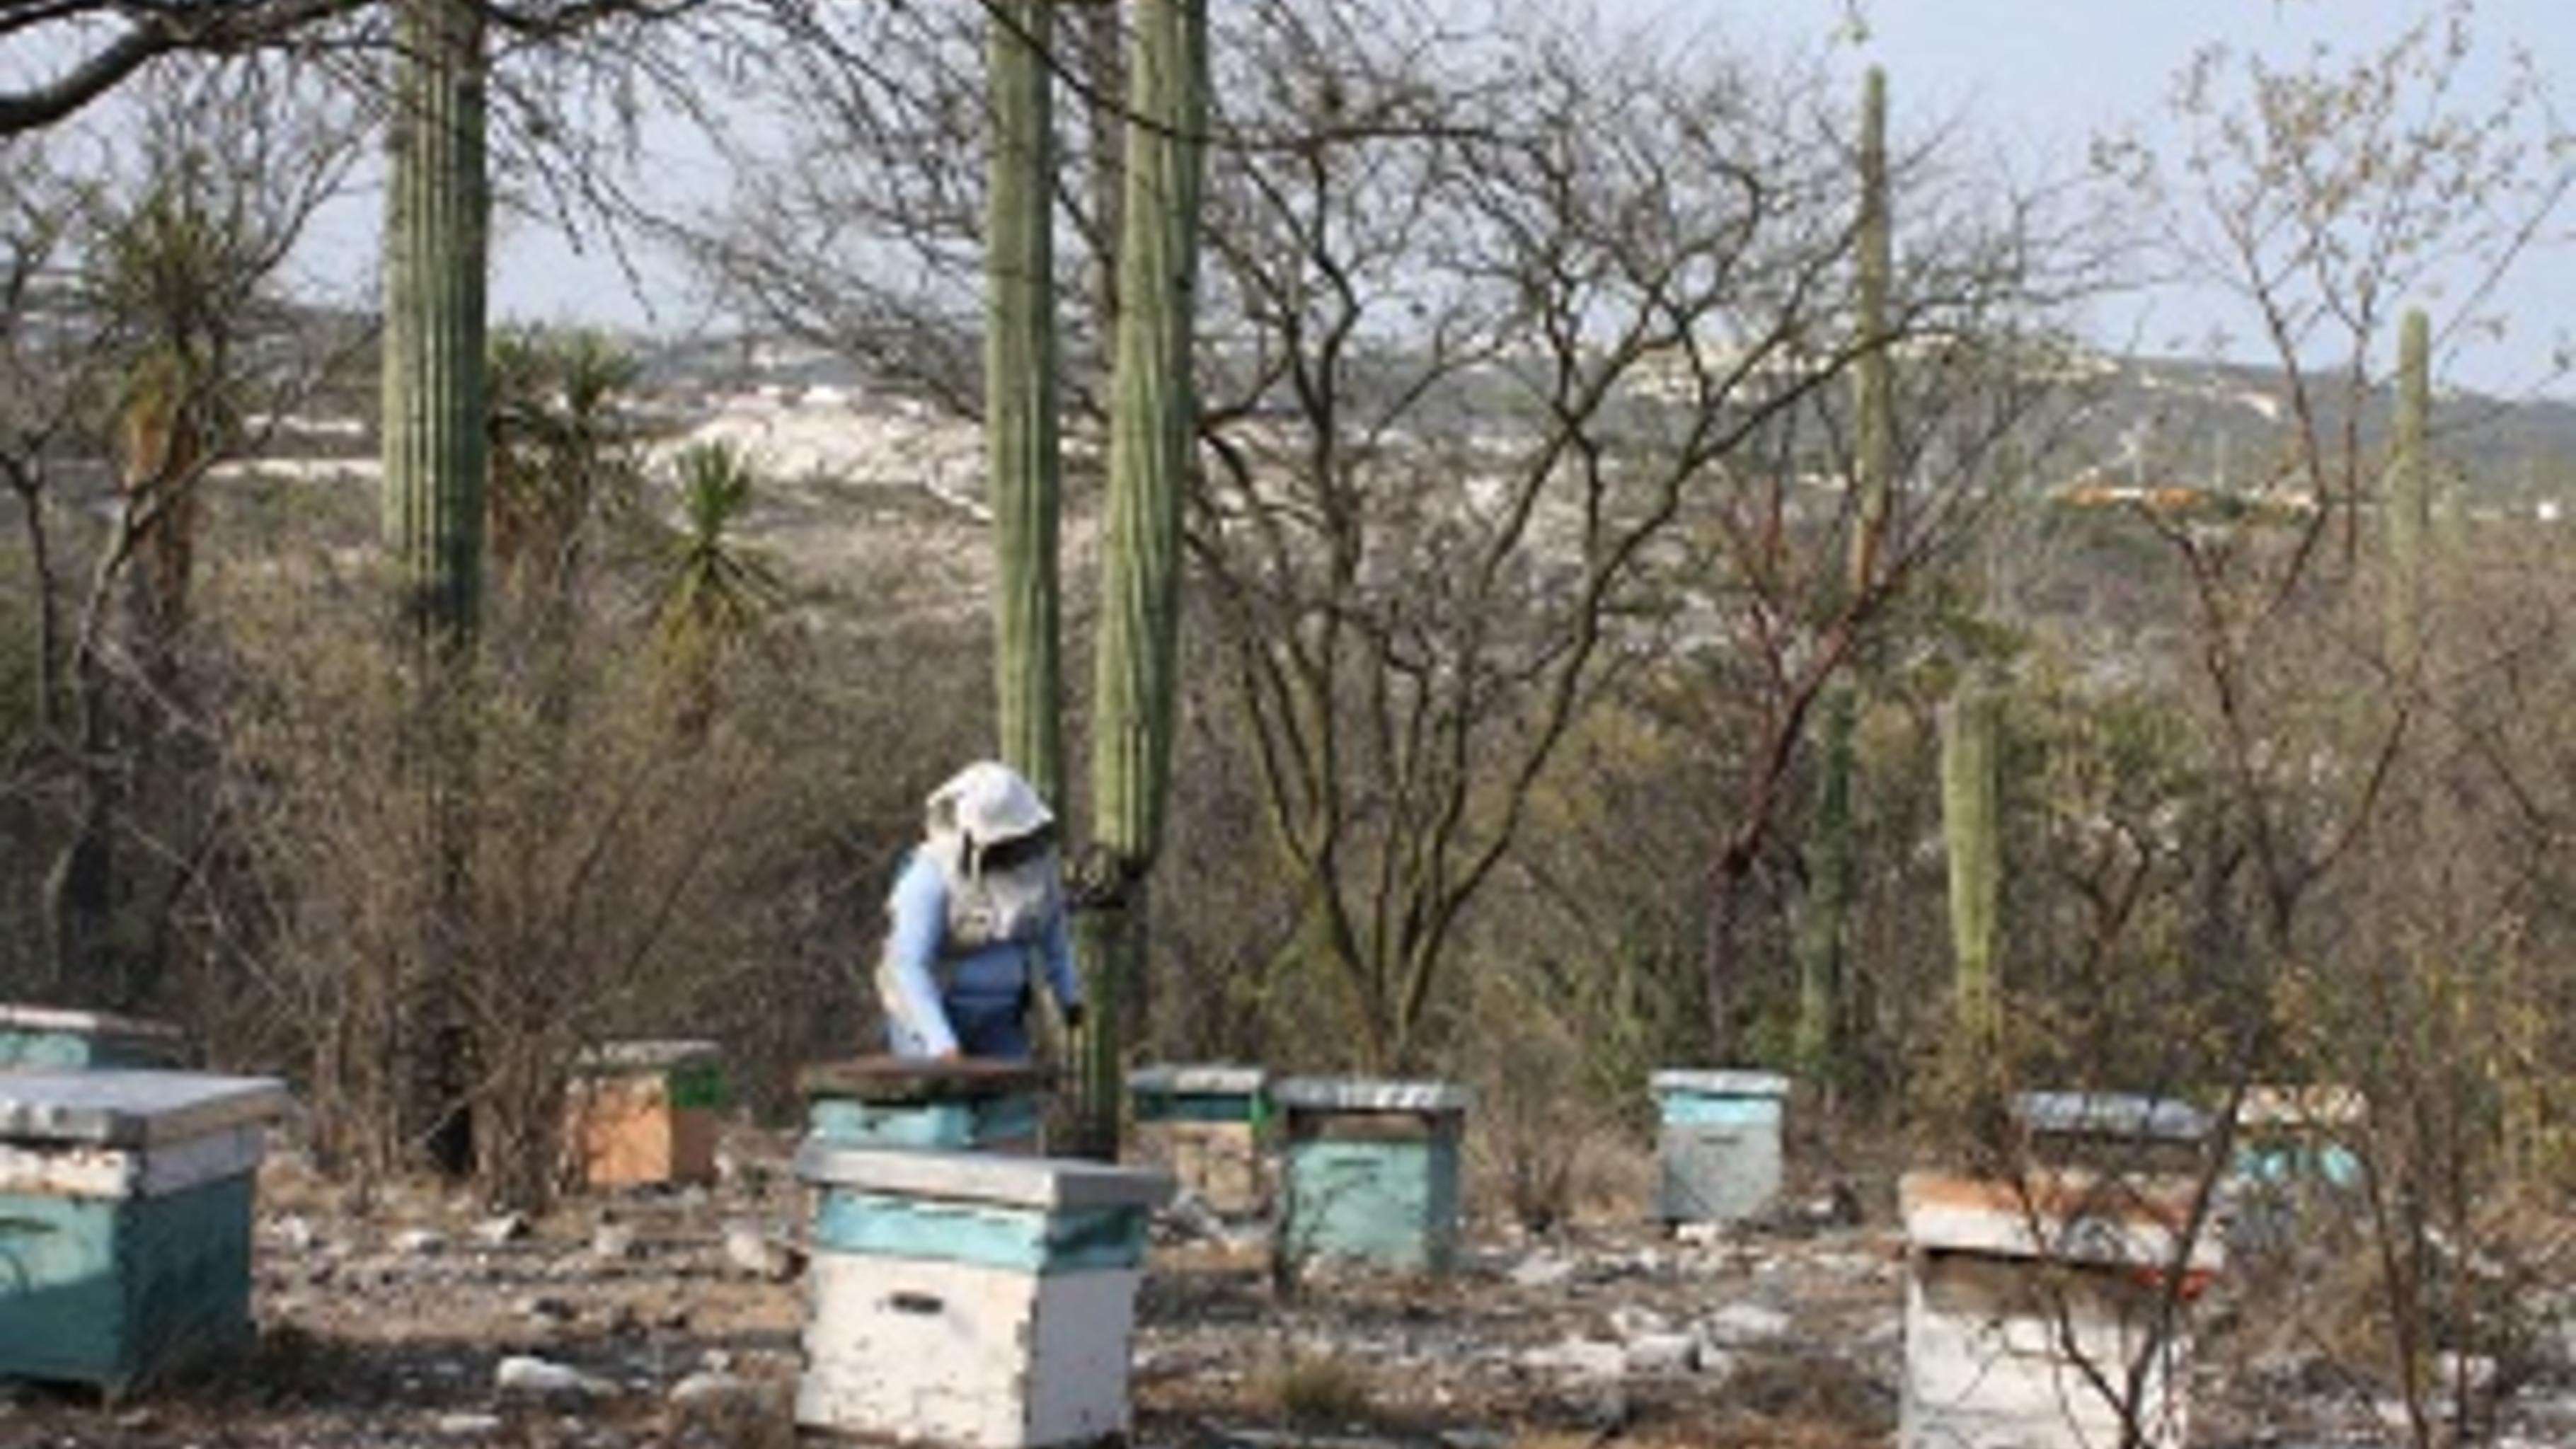 Oliveria Aguilar Perez versorgt ihre Bienen in Tepexi, Mexiko.